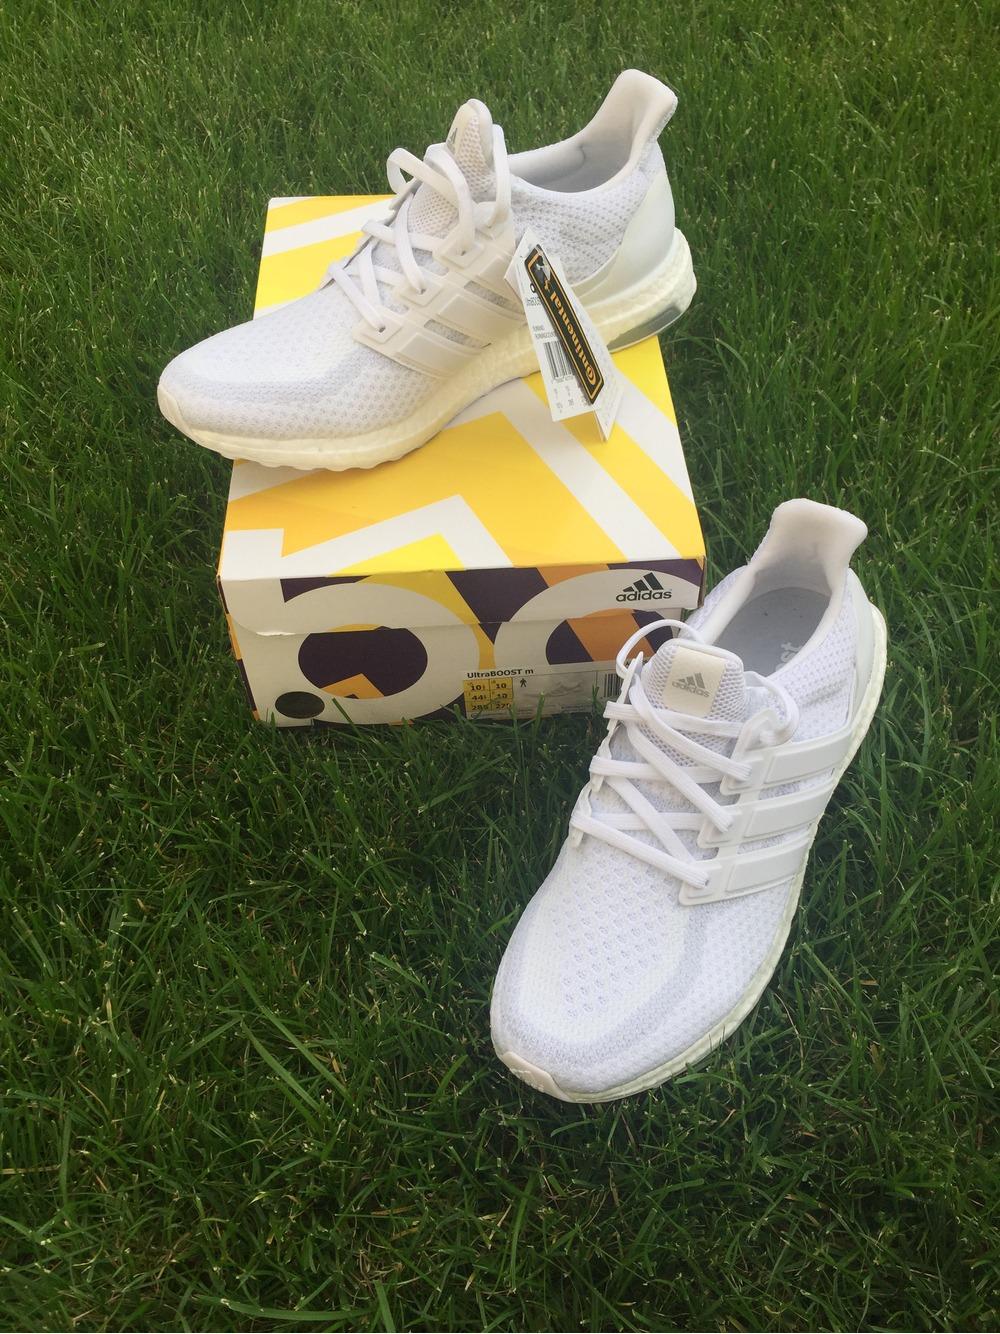 Adidas Ultra Boost White 2.0 44 bd2c4409fcea3